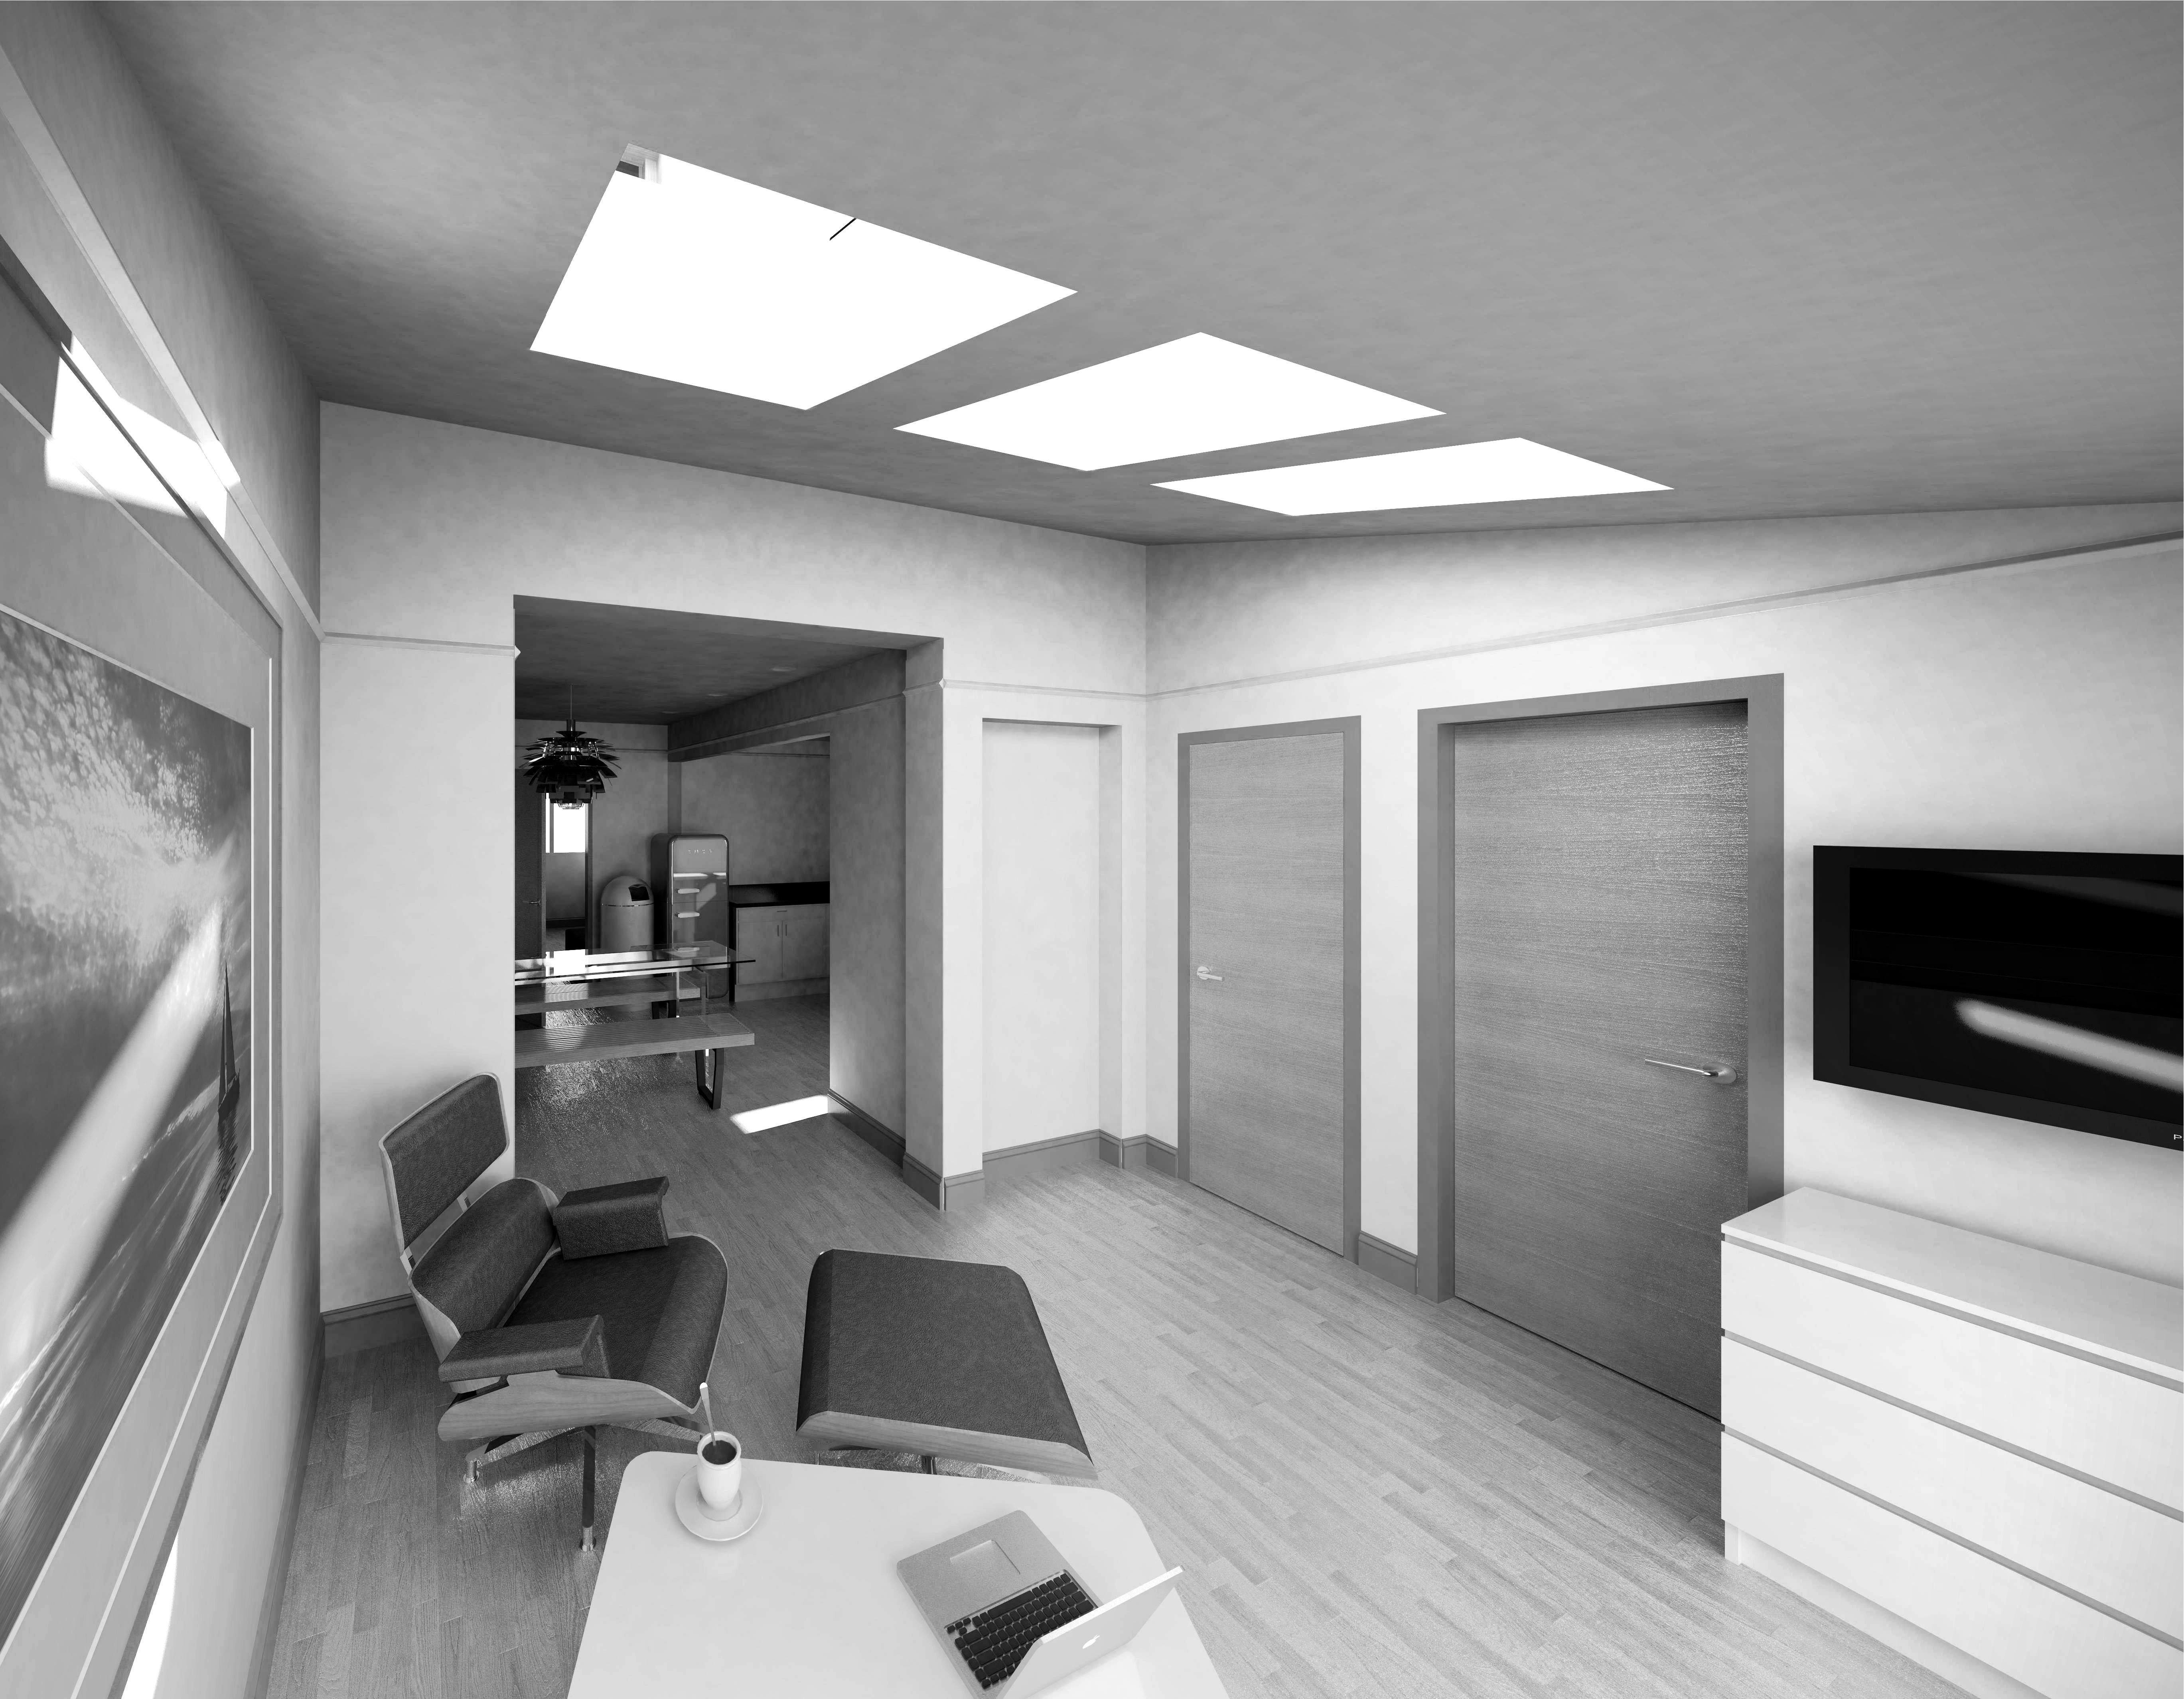 Single Storey Extension and Loft Conversion